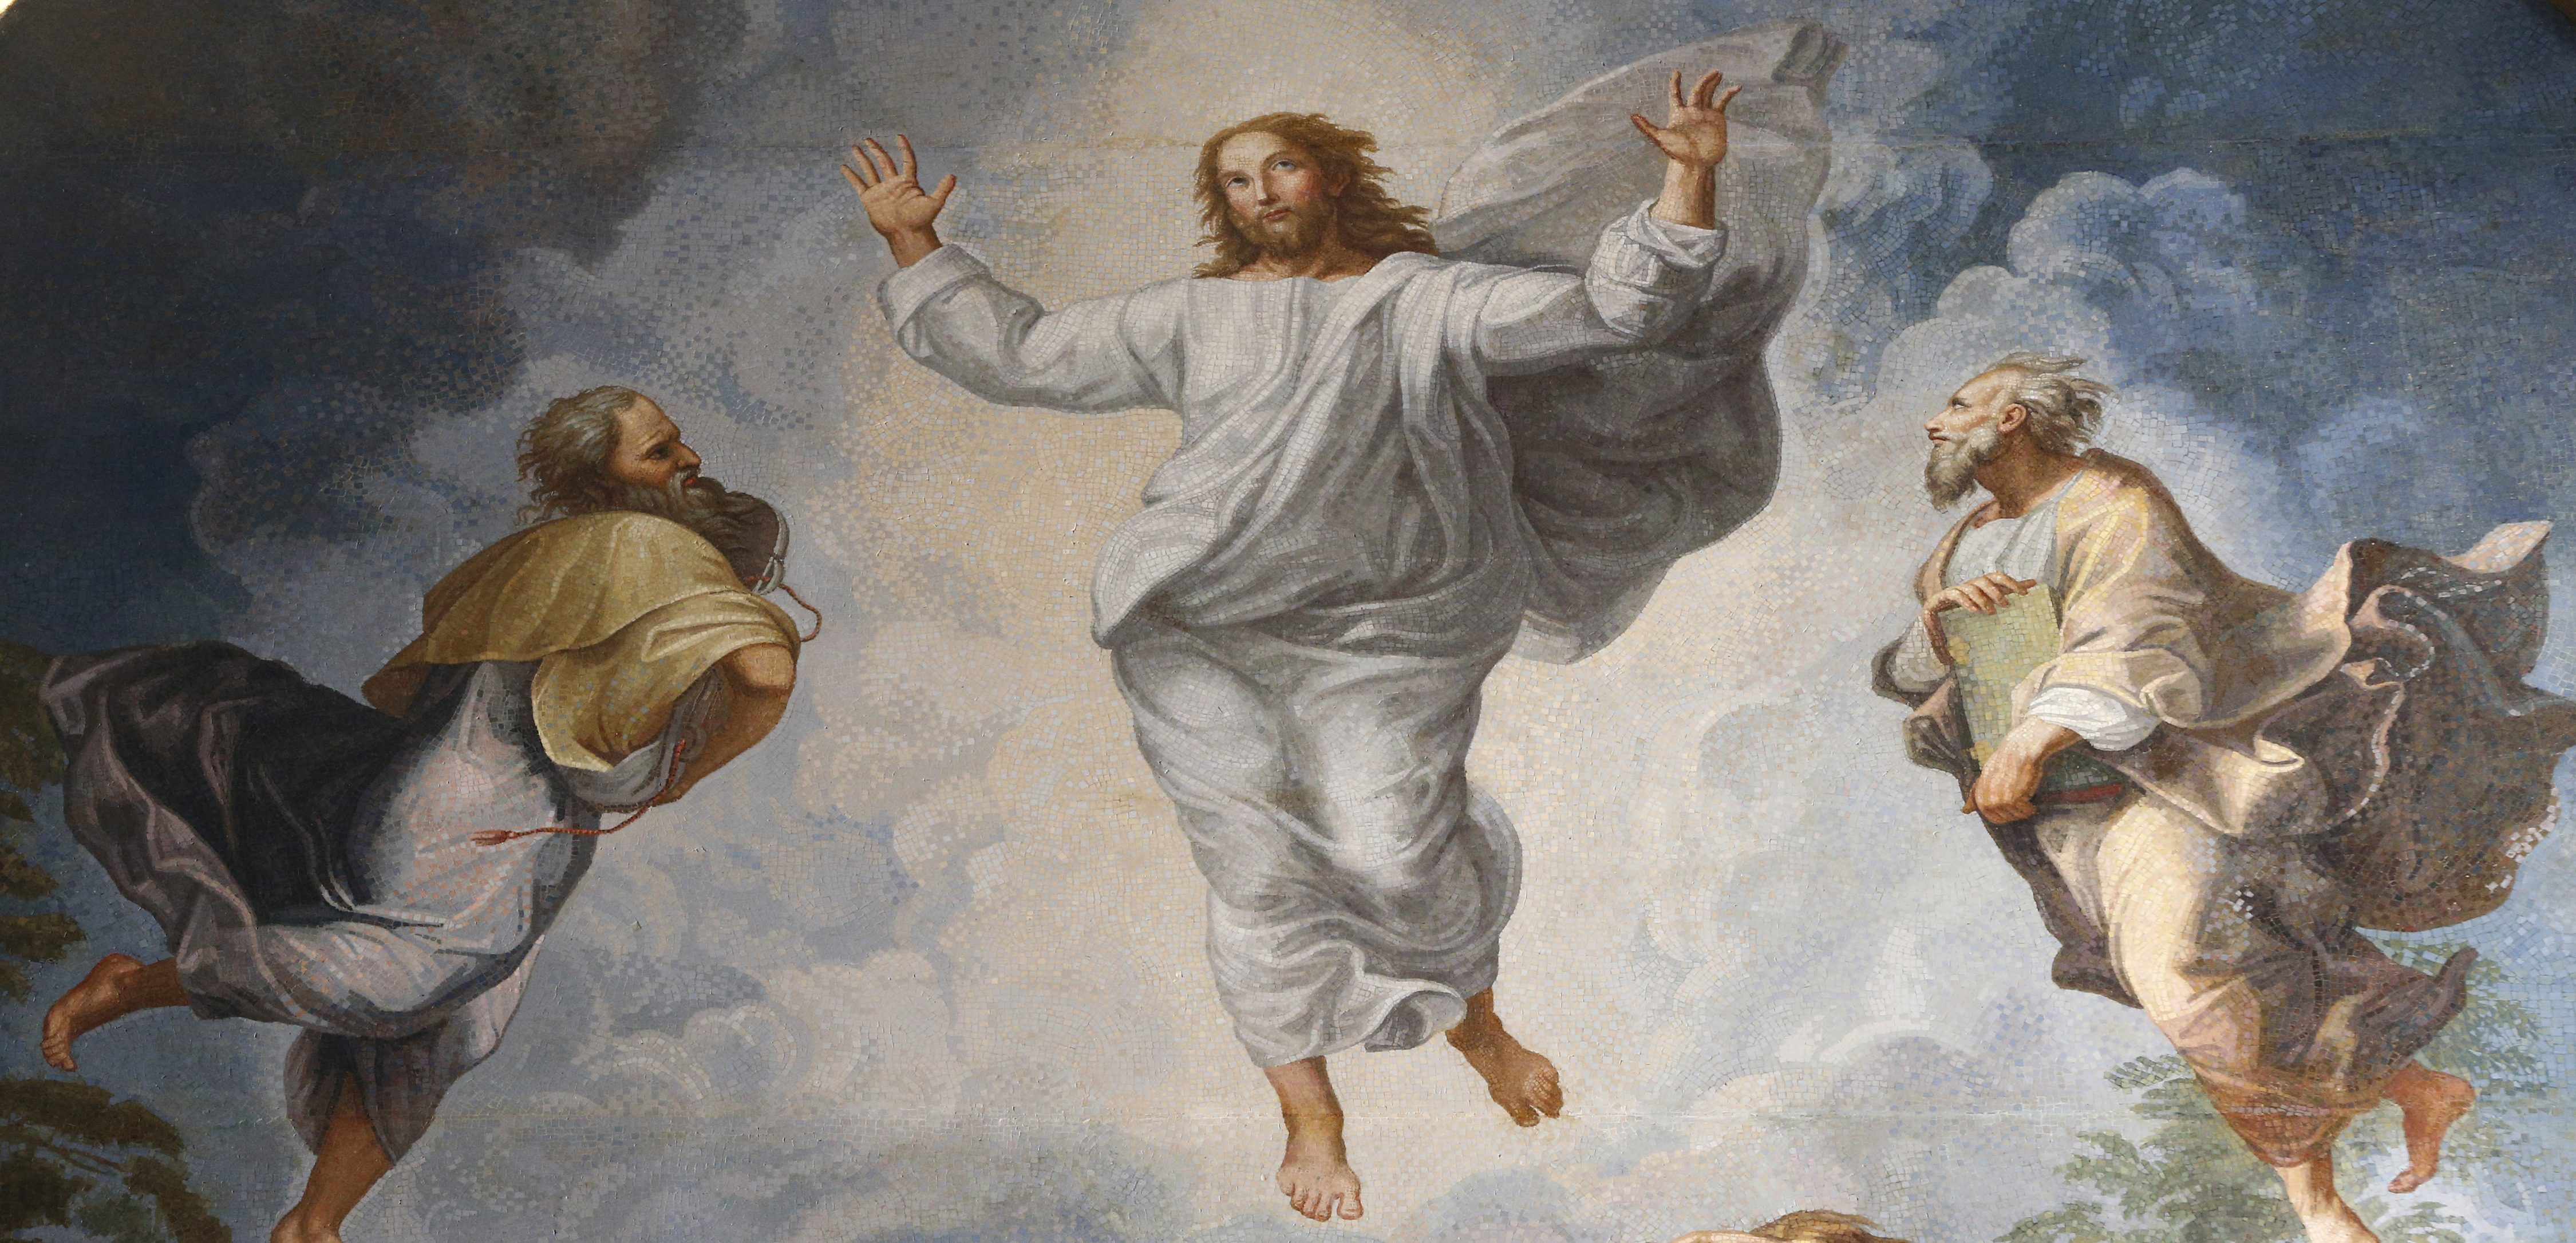 WEB2-RESURRECTION-CHRIST-GODONG-it324647a-e1586681874732.jpg